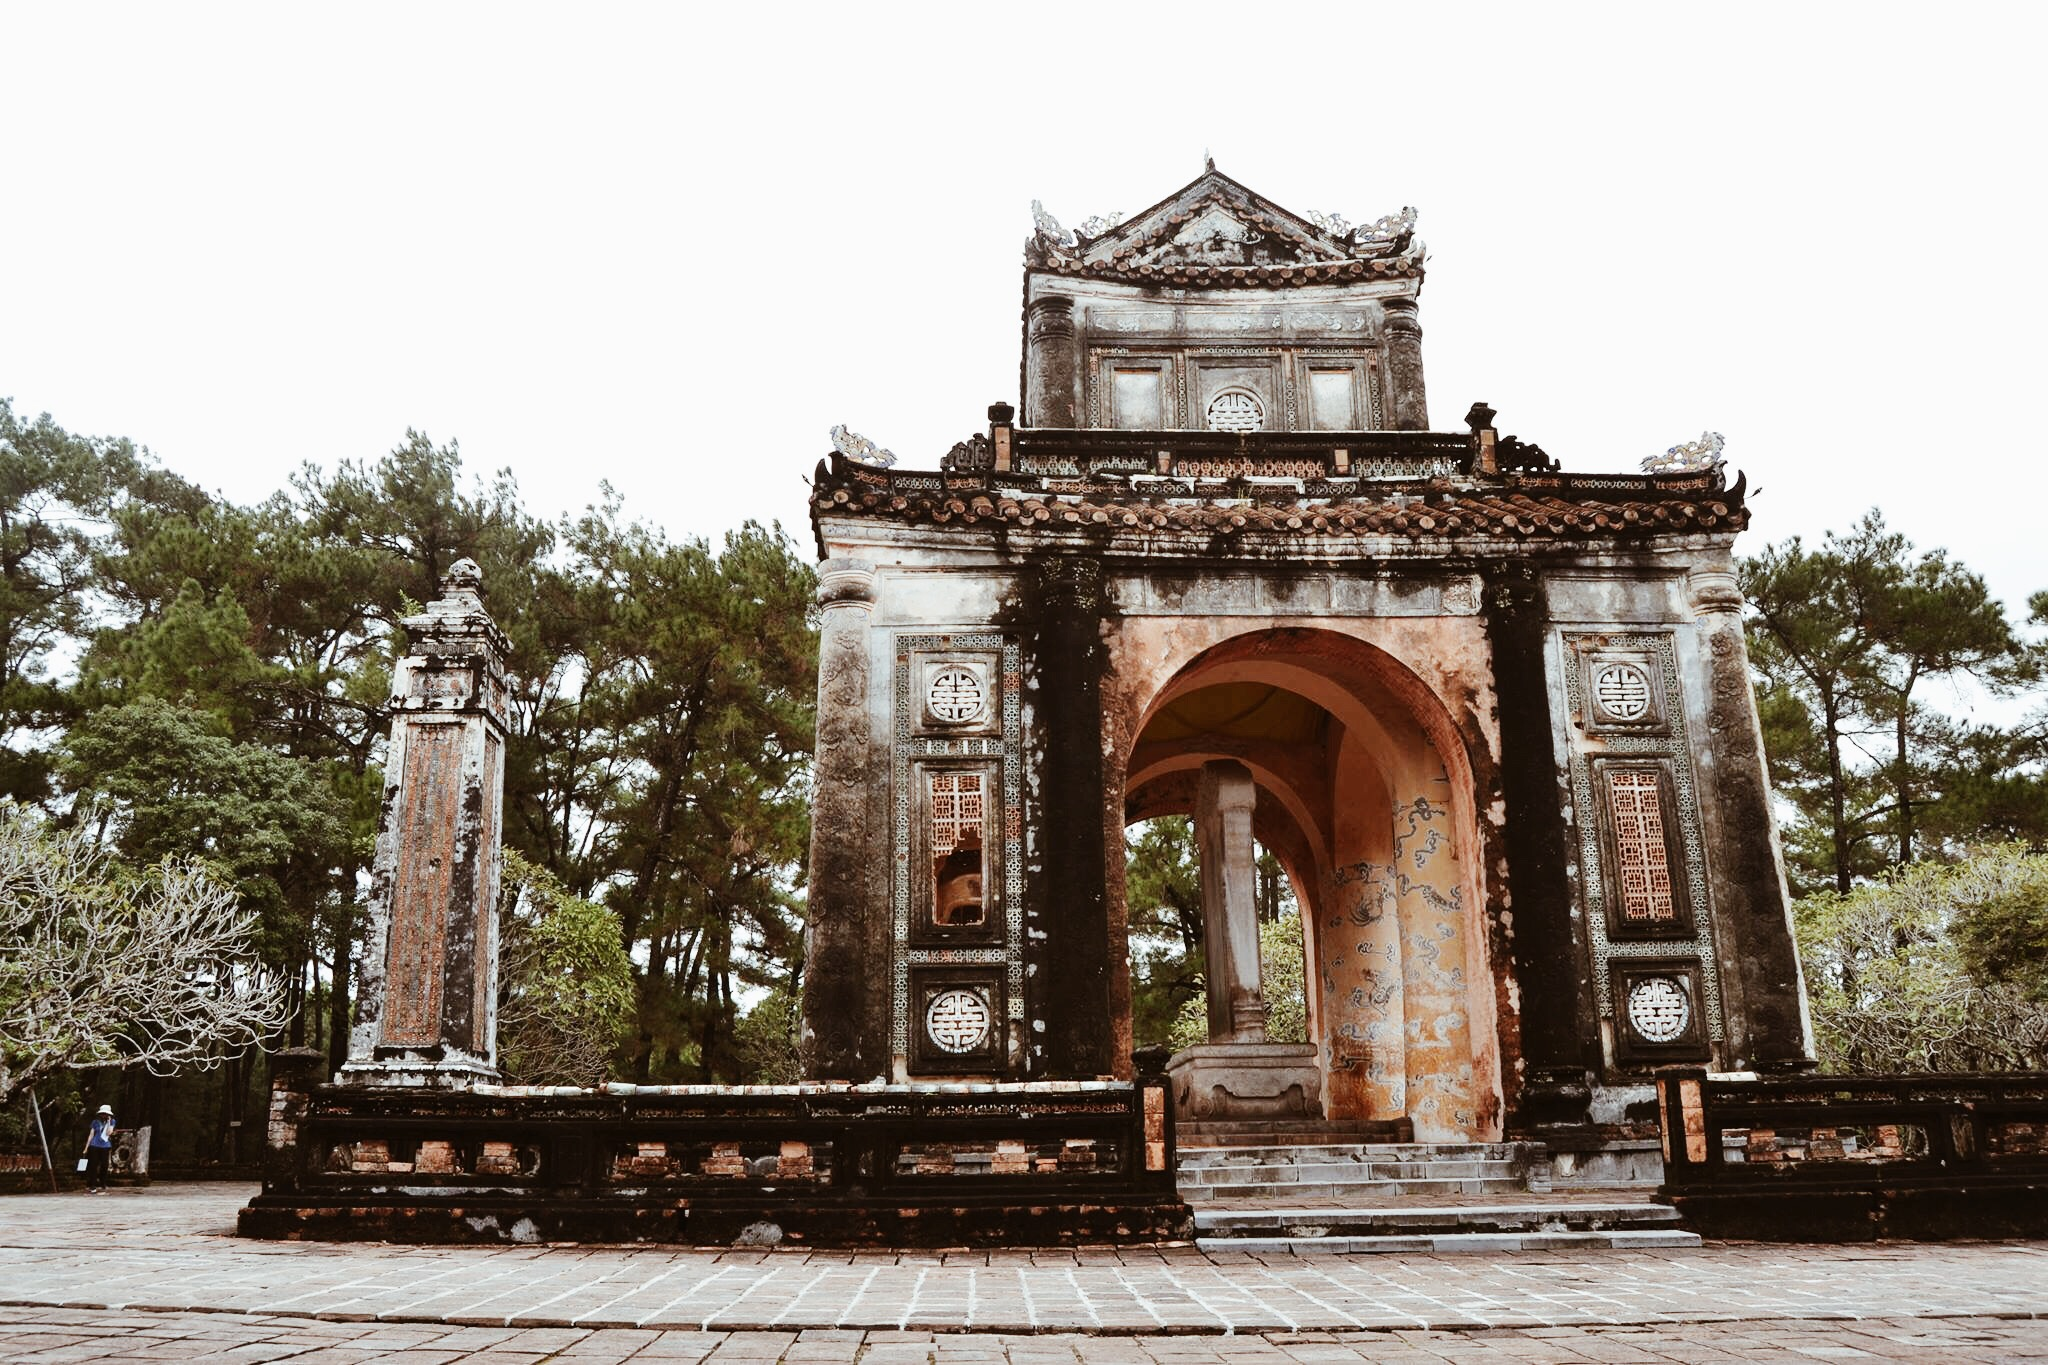 Hue - Pagode Tu Duc - Vietnam - Wonderluhsters